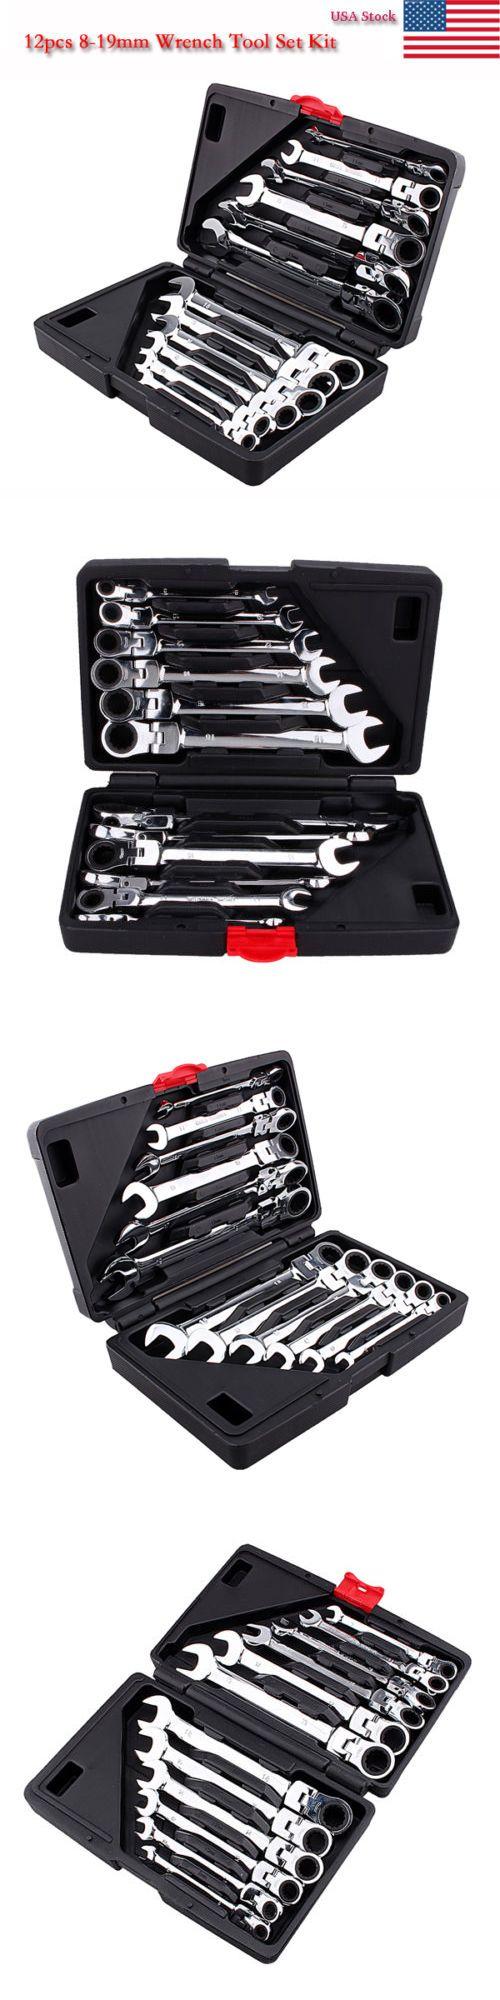 Case 12pcs 8-19 mm Metric Flexible Ratchet Spanner Wrench Tools Set Repair DIY